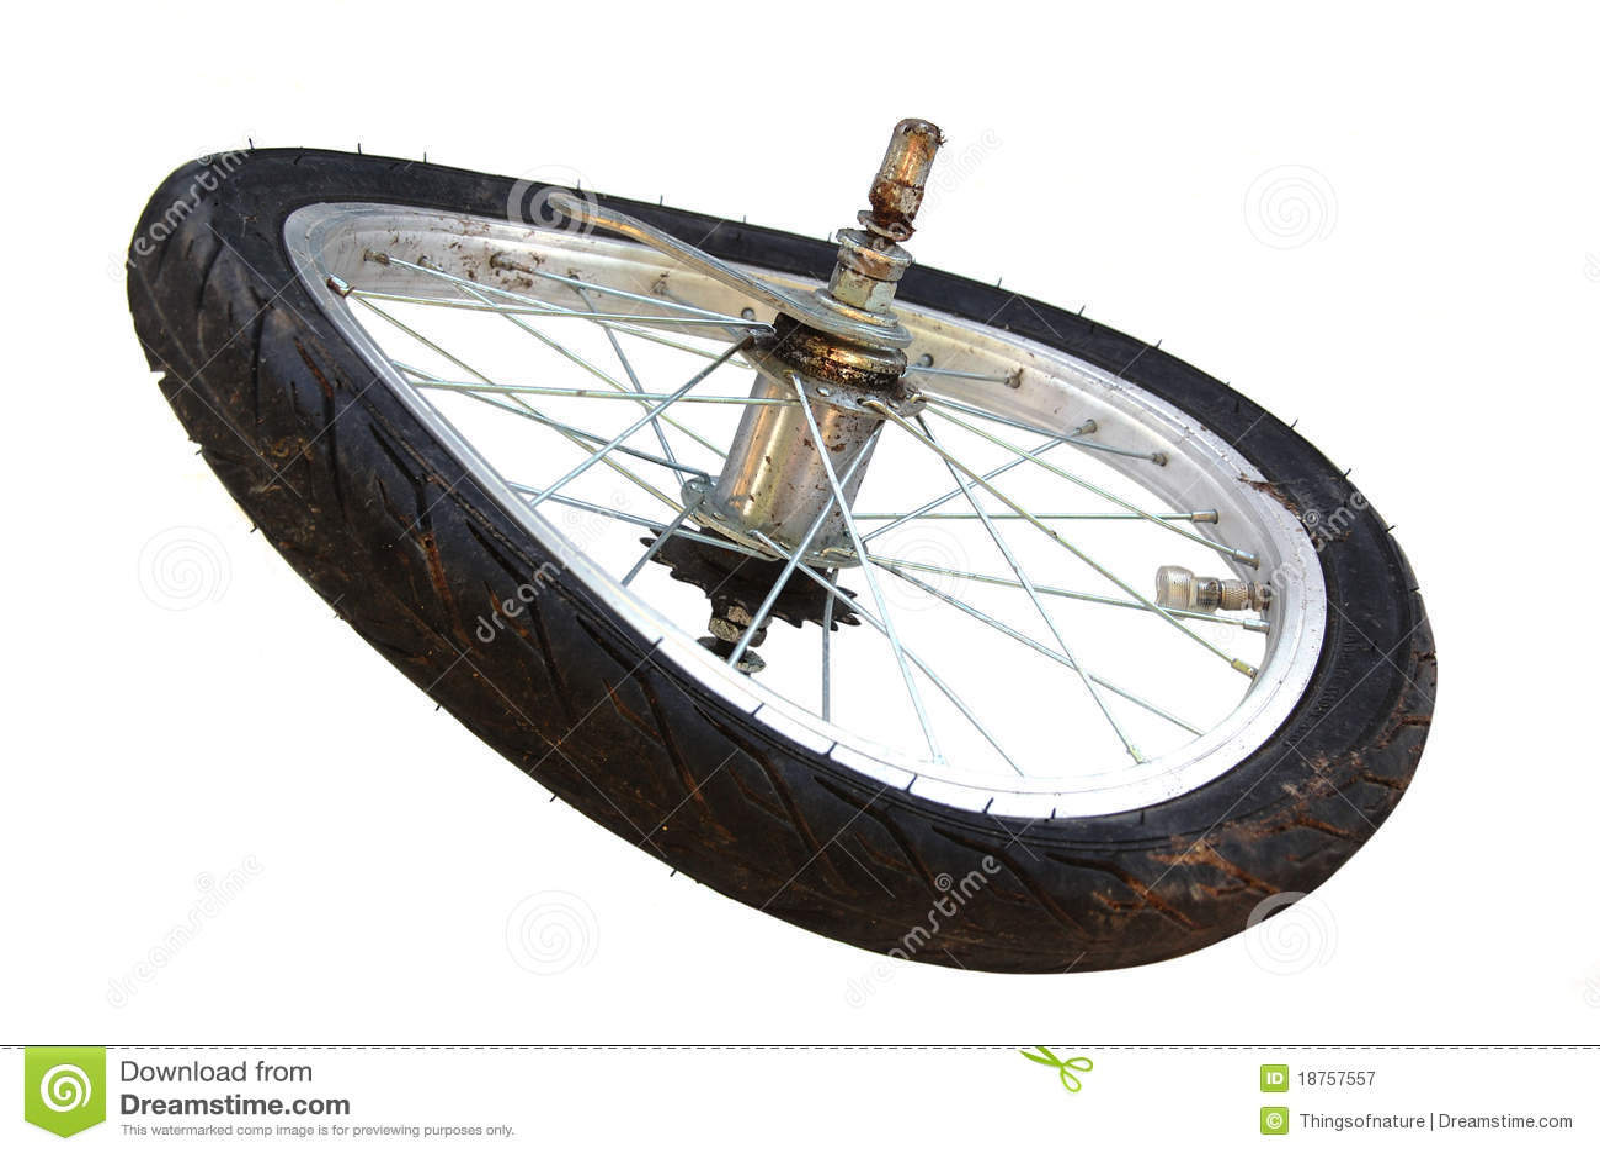 Broken Wheel Clip Art : Broken tire royalty free stock photography image